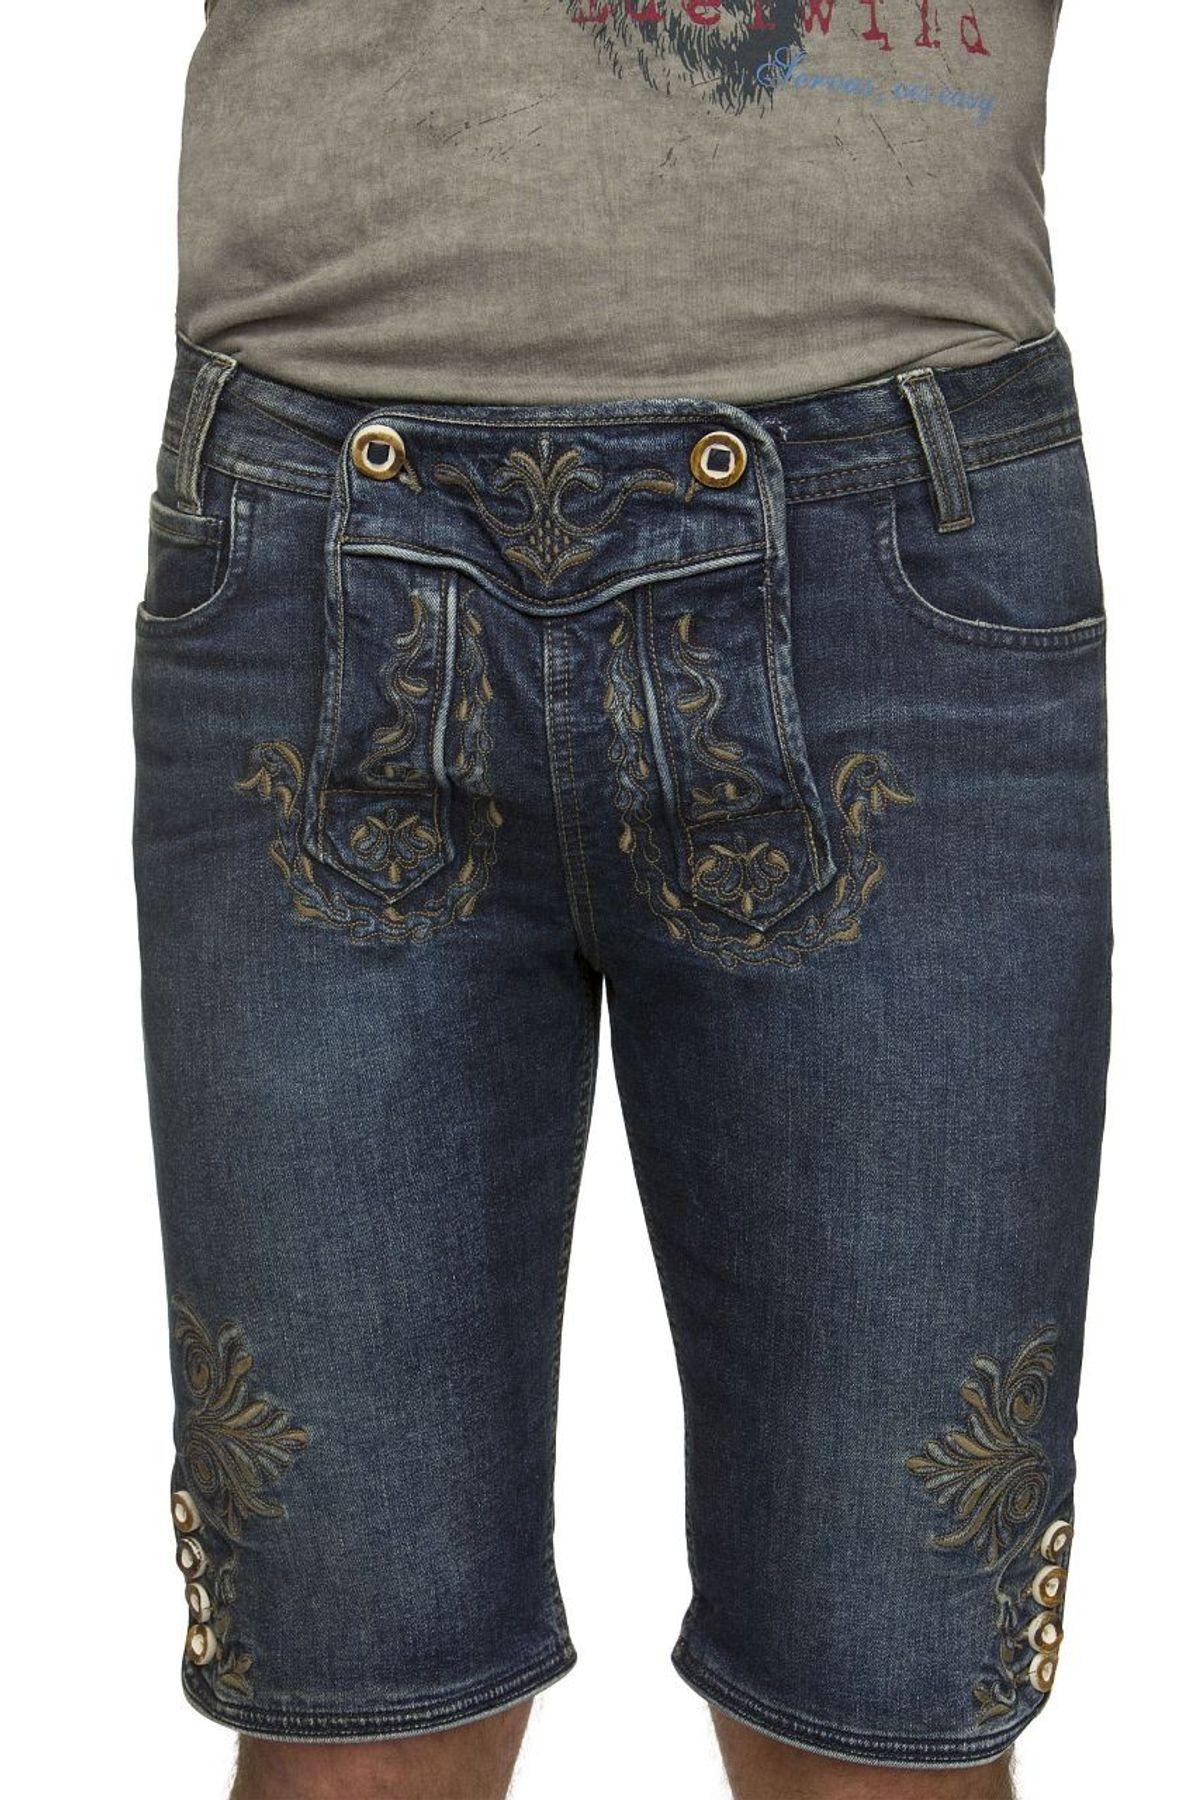 Stockerpoint - Herren Trachtenshort Jeans, Mick – Bild 3